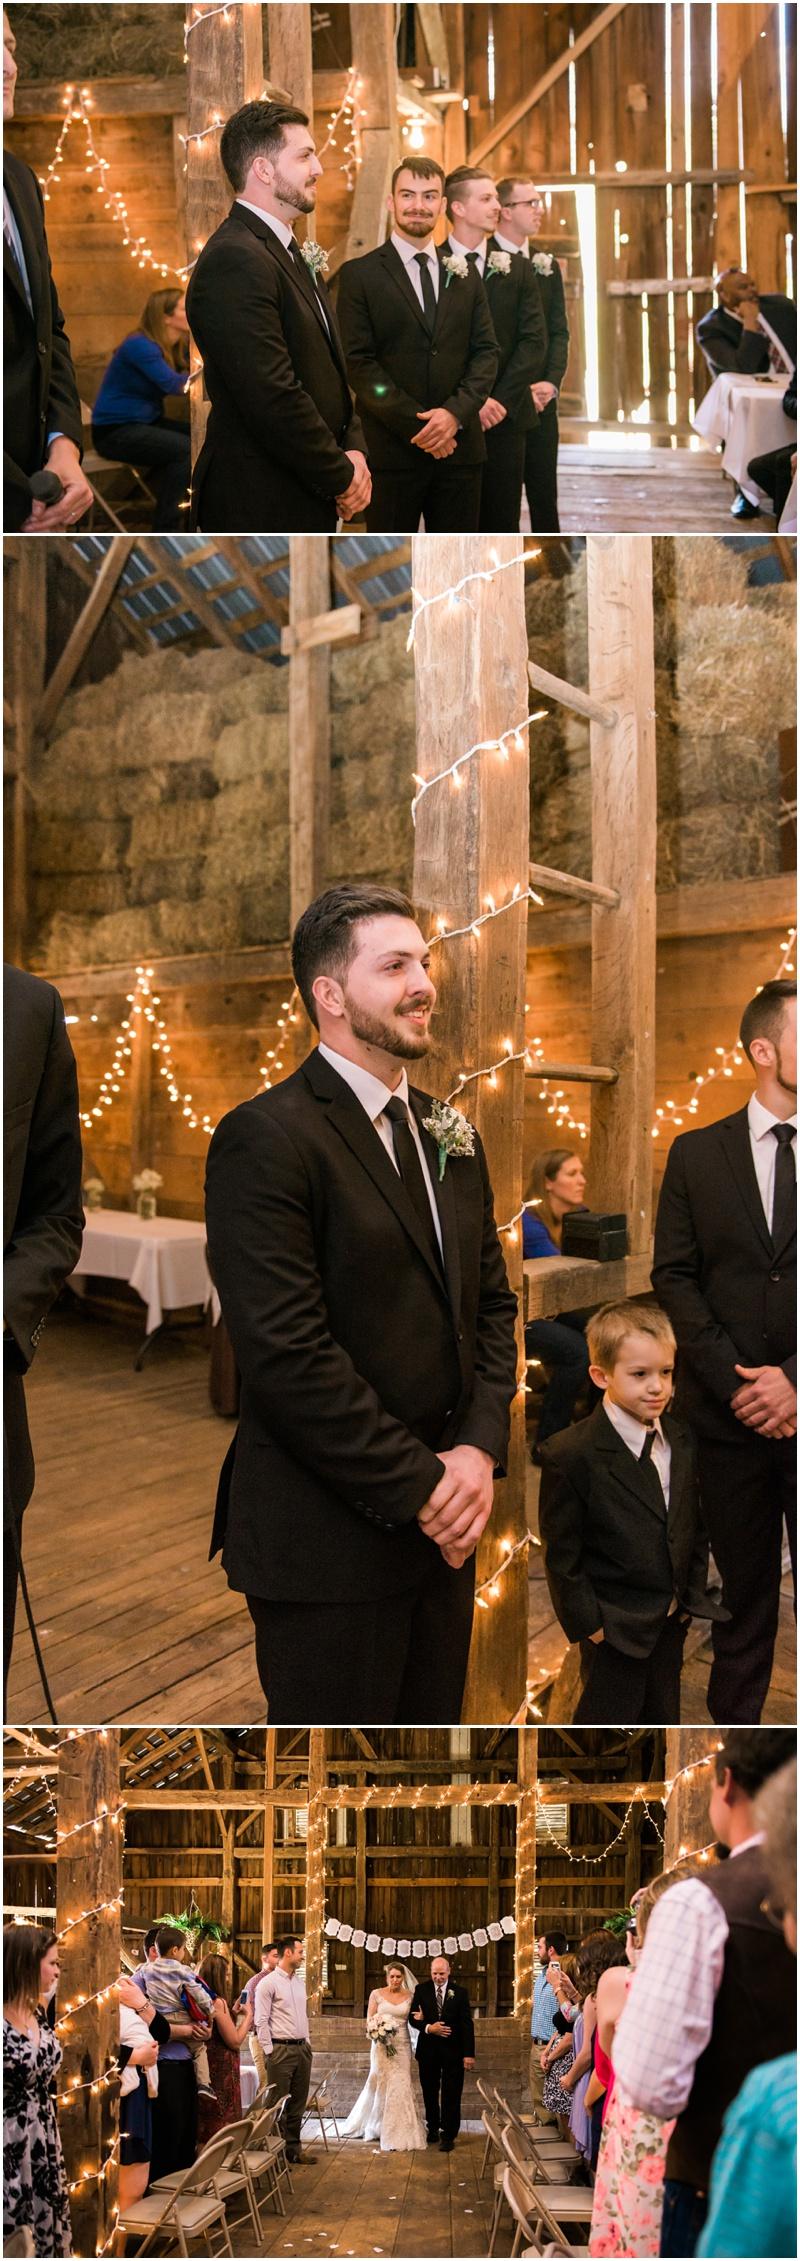 Heckman-Hayhurst Wedding-212.jpg